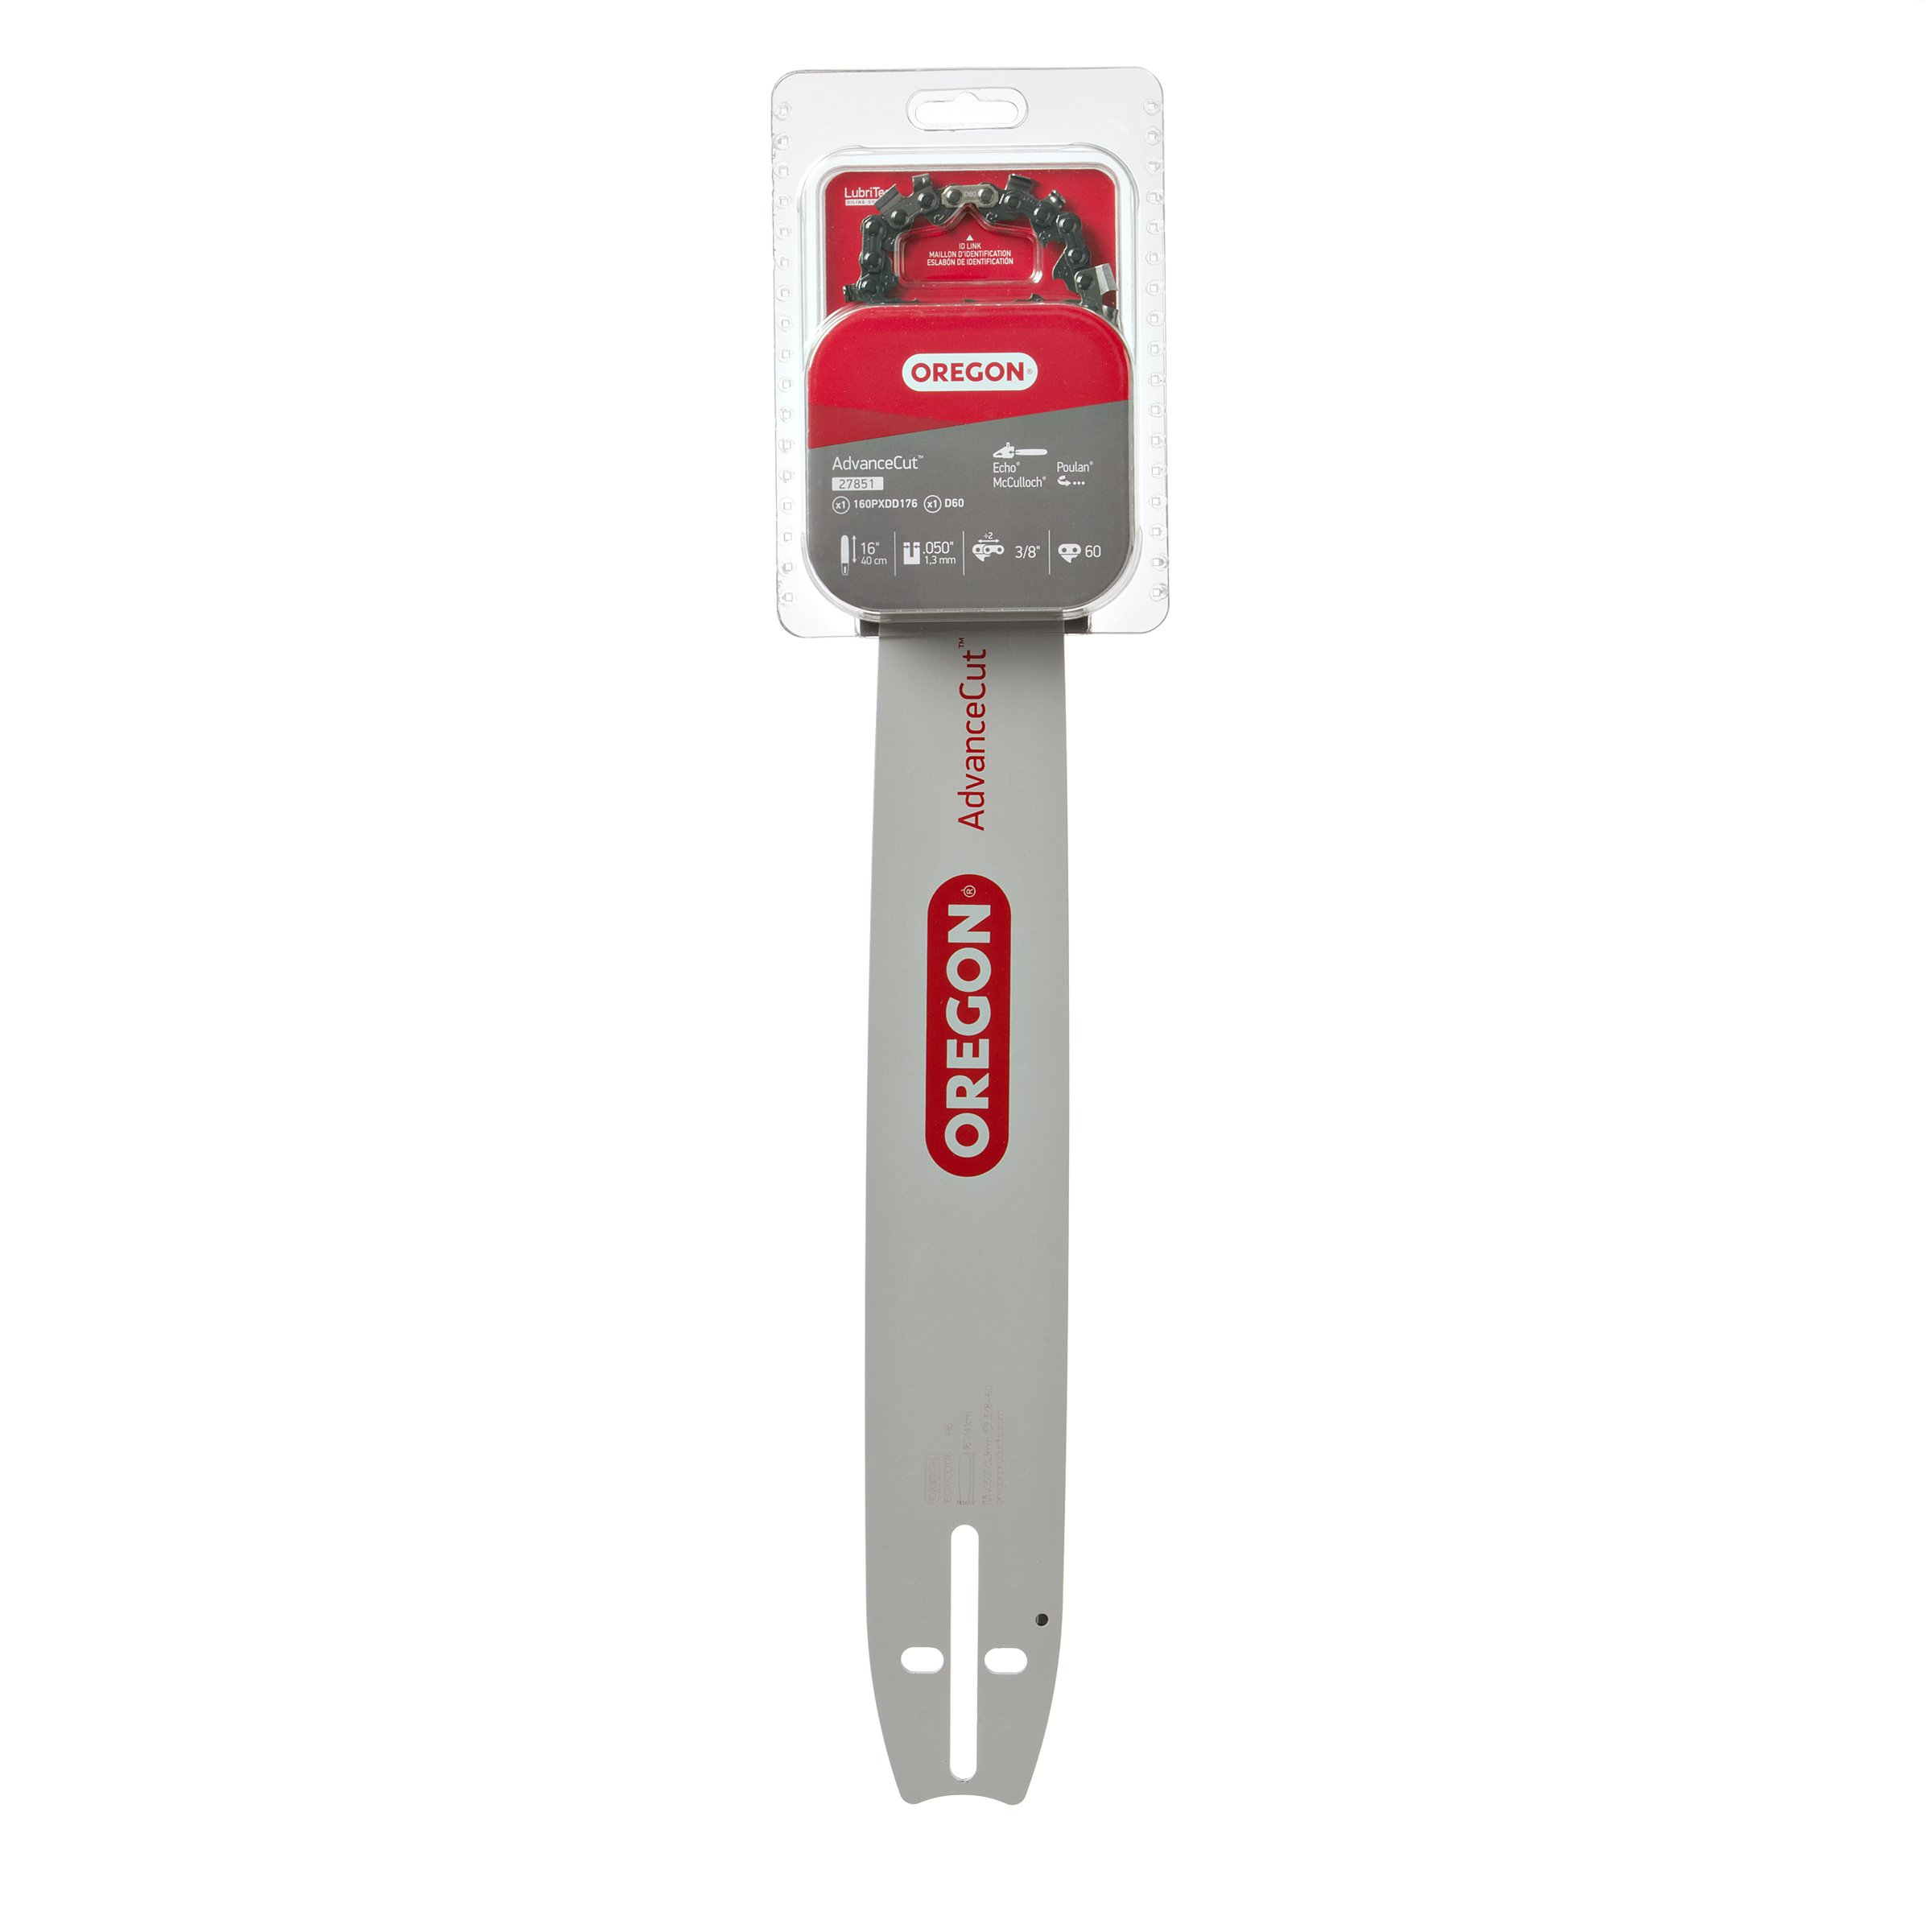 Oregon 16-Inch Bar & 72V Chain Saw Blade Combination Fits Craftsman, Echo, McCulloch 27851